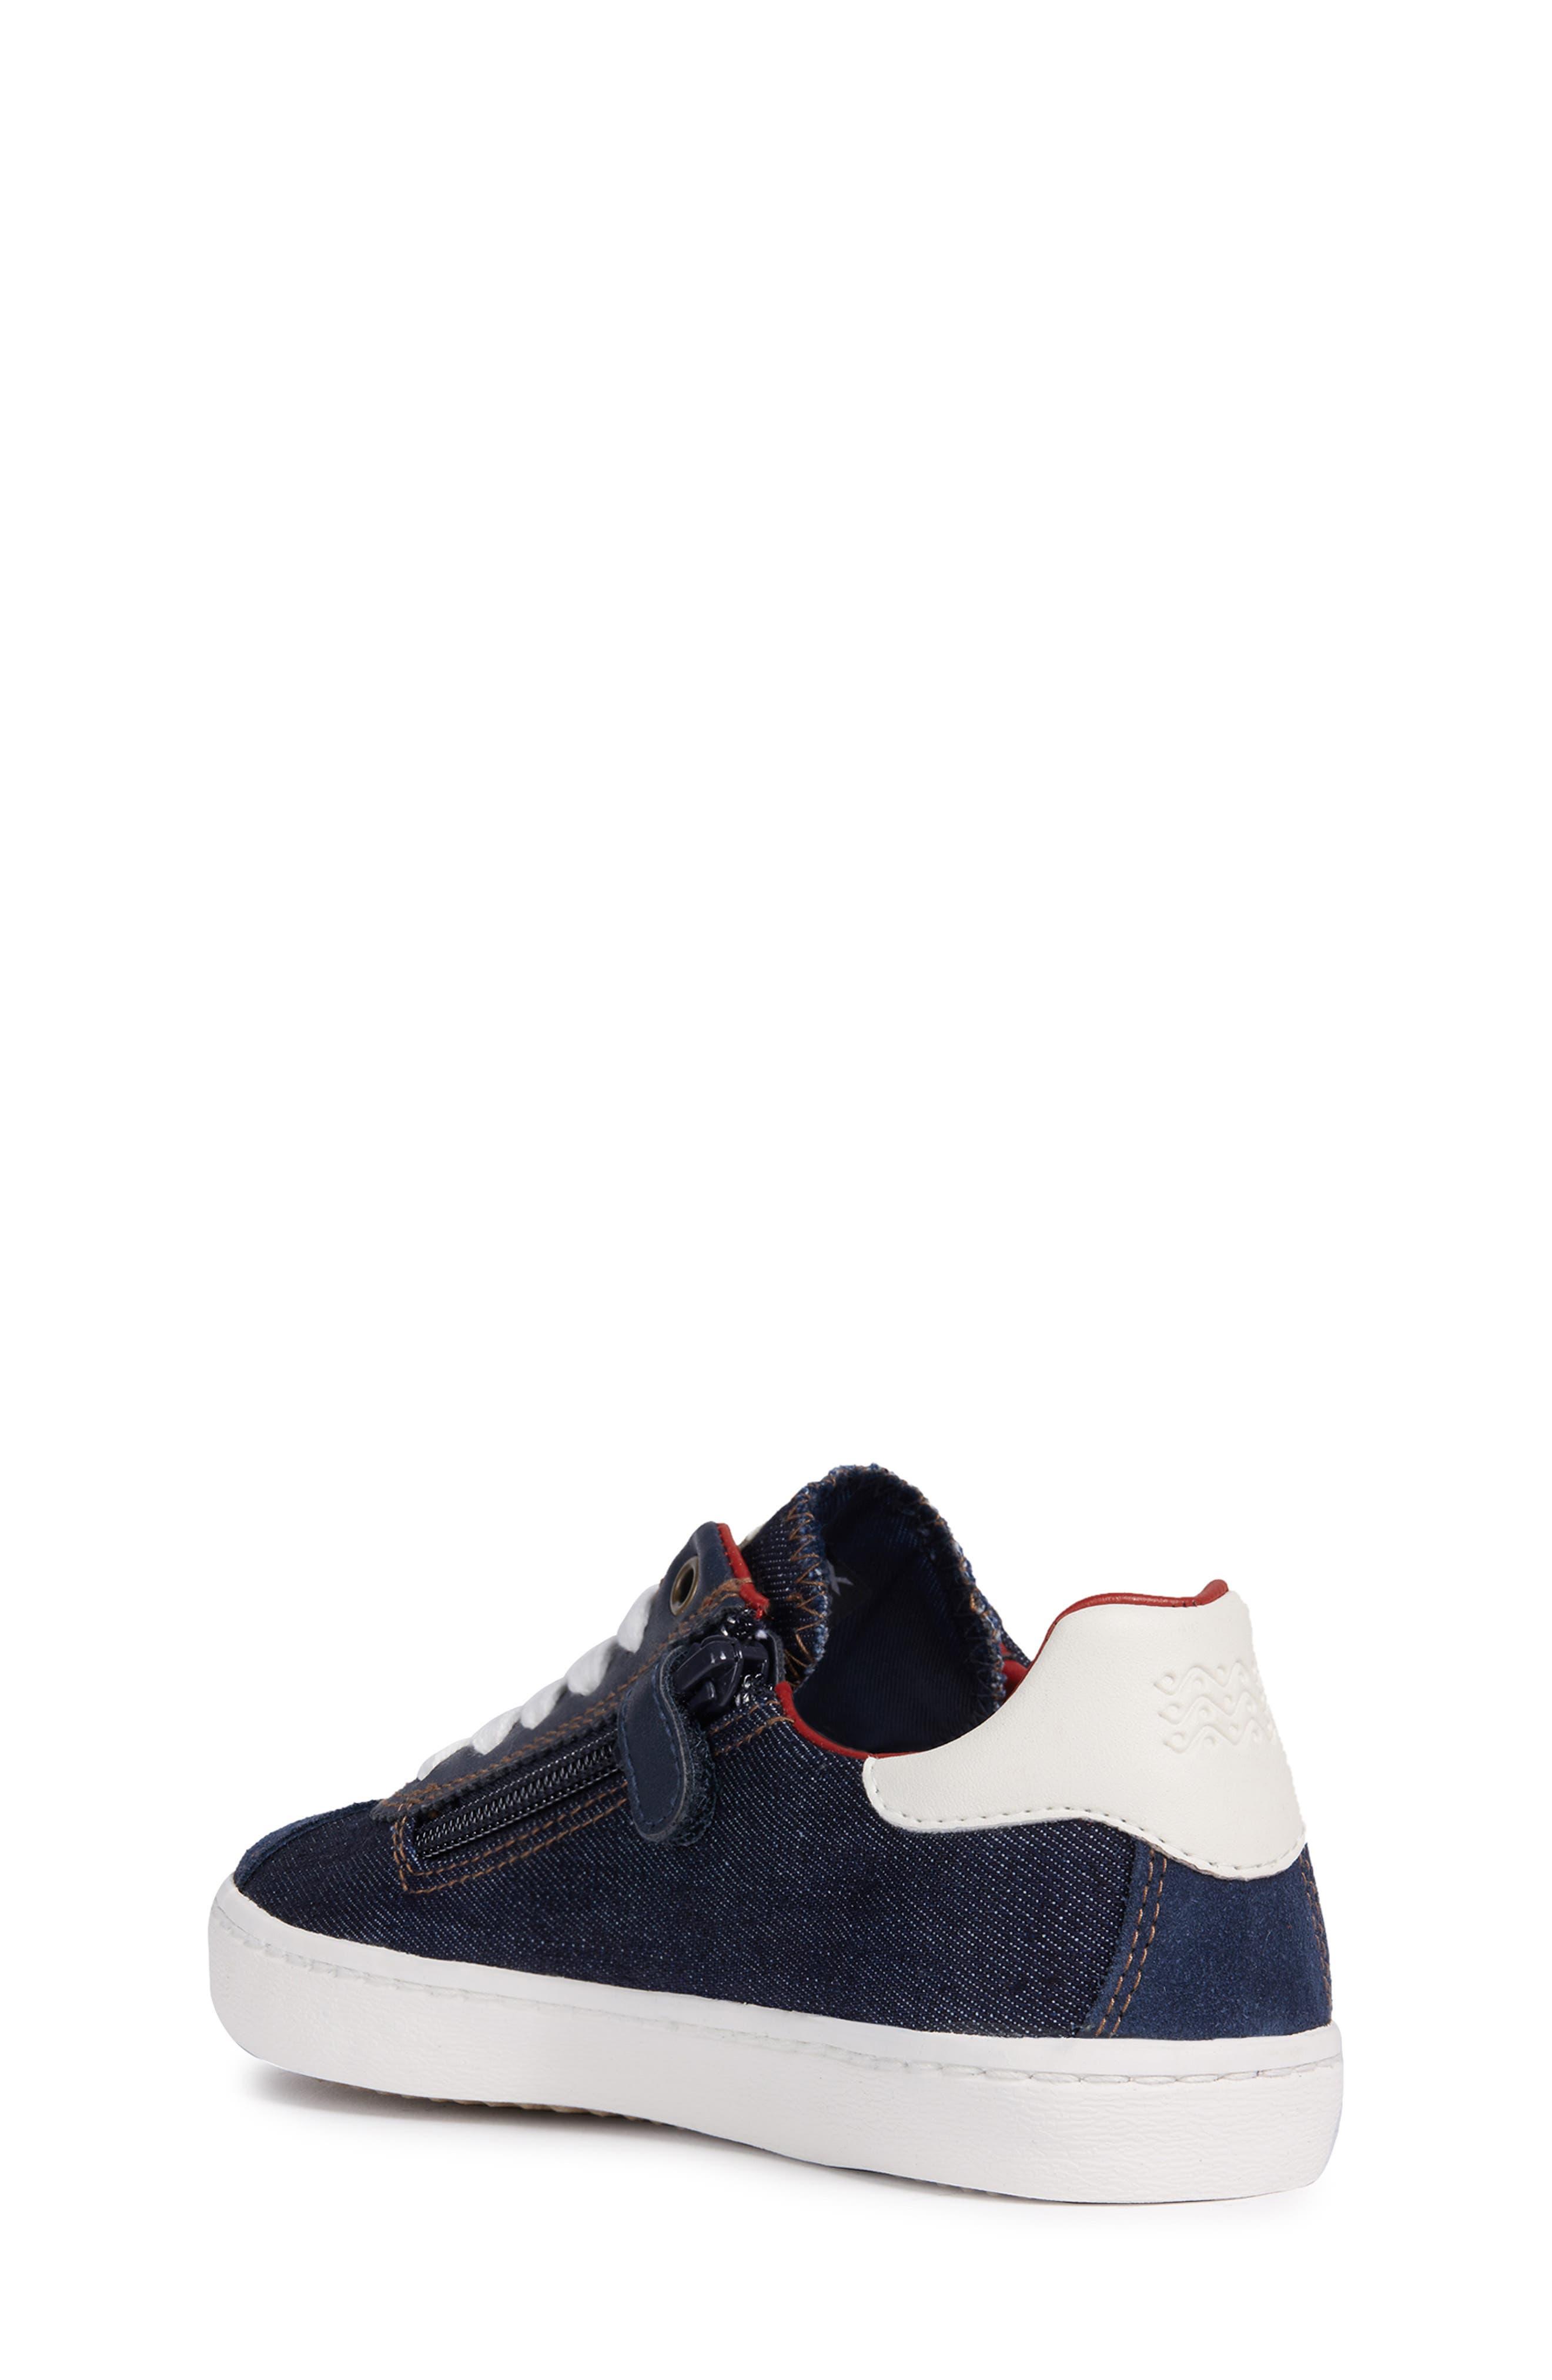 Kilwi Zip Low Top Sneaker,                             Alternate thumbnail 2, color,                             NAVY